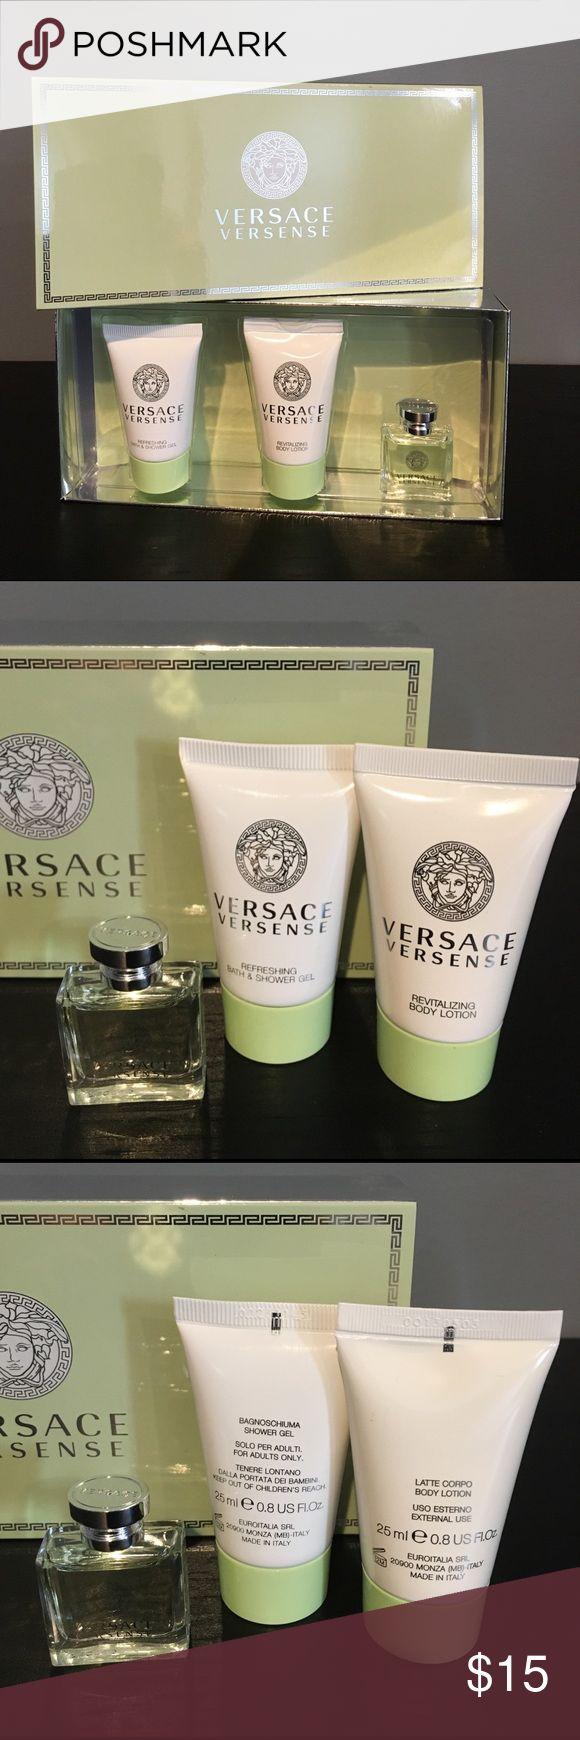 Versace Versense Gift Set Versace Versense Gift Set. 100% Authentic Versace. Refreshing Bath & Shower Gel - 25ml 0.8 fl.oz. Revitalizing Body Lotion - 25ml 0.8 fl.oz. Frag. - 5ml 0.17 US fl.oz. MINI SIZE, TRAVEL SIZE. Versace Other